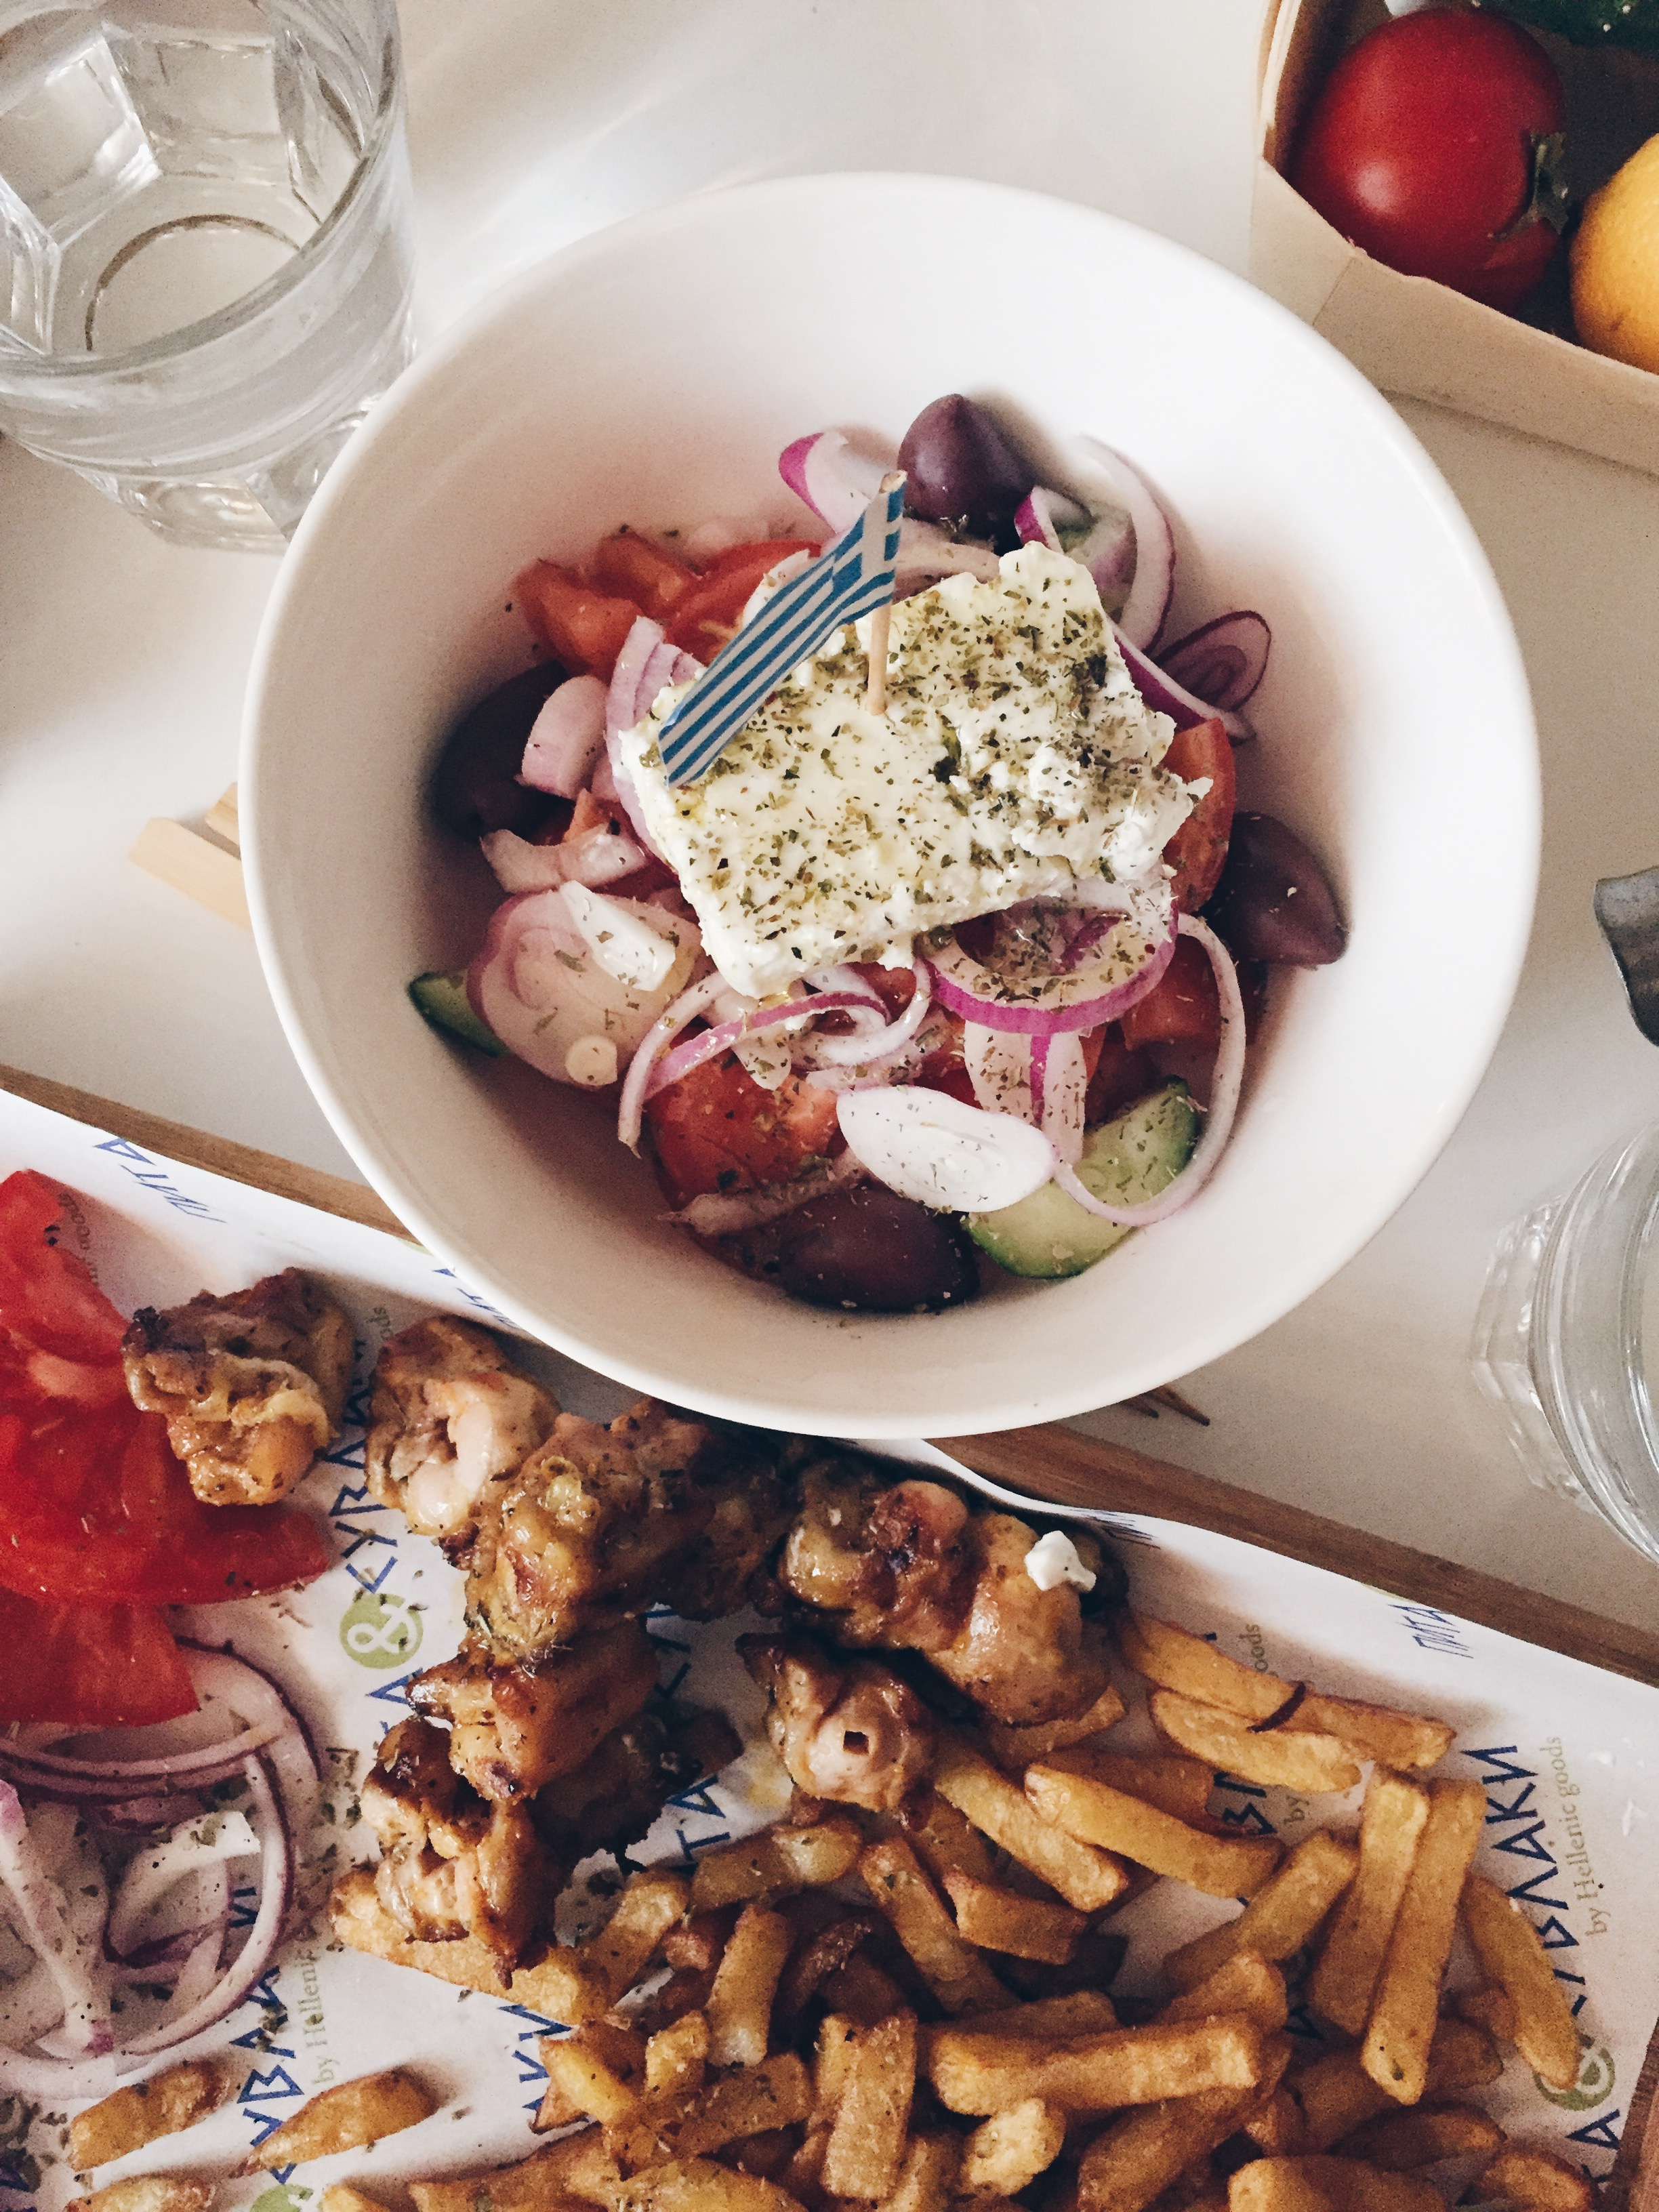 Pita & Suvlaki - Dinner with friends and a big slab of feta!